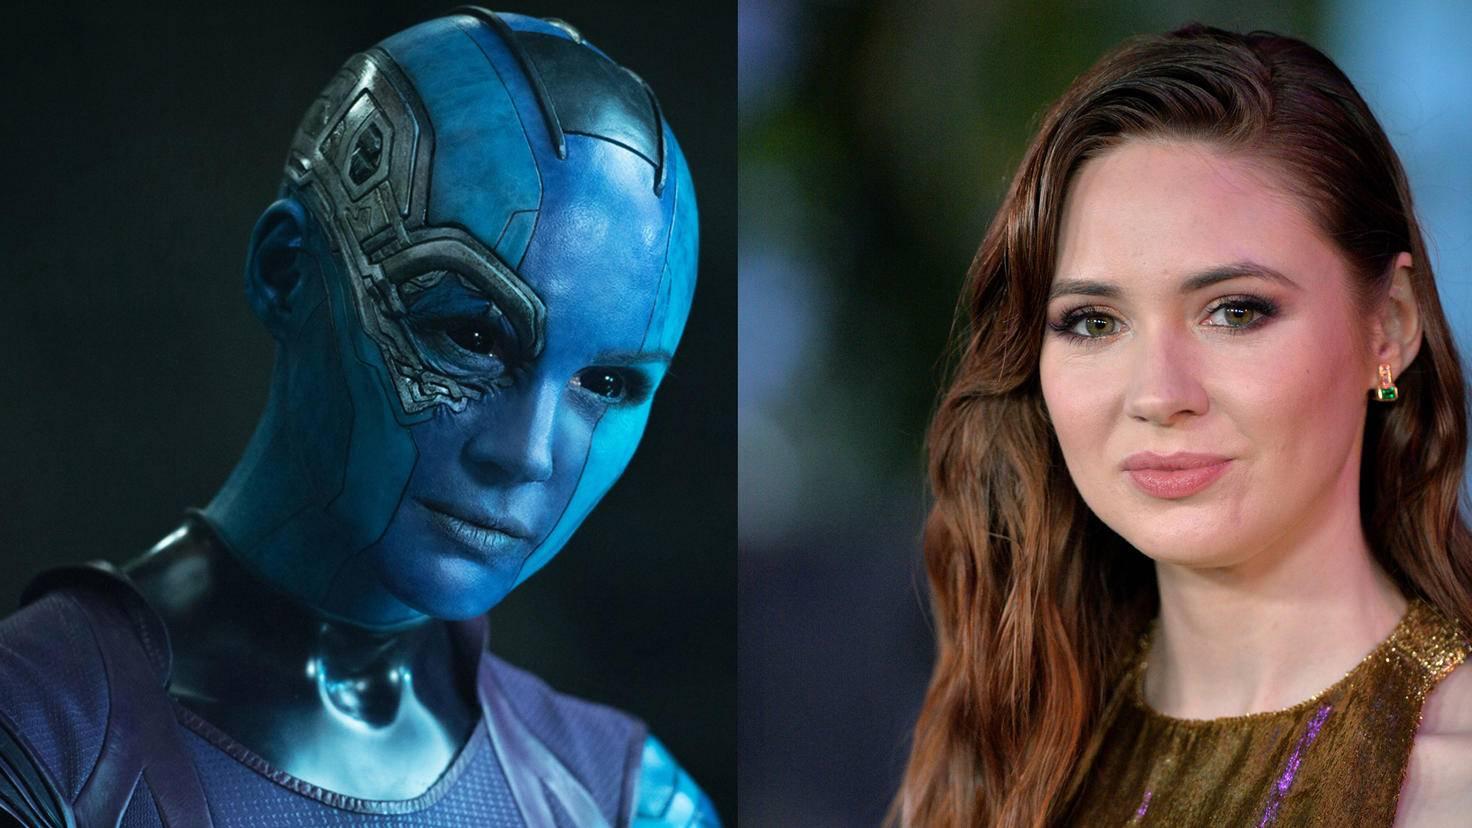 Guardians_Of_The_Galaxy_Jay Maidment-Walt Disney Studios-Karen Gillan-picture alliance-abaca-97869363